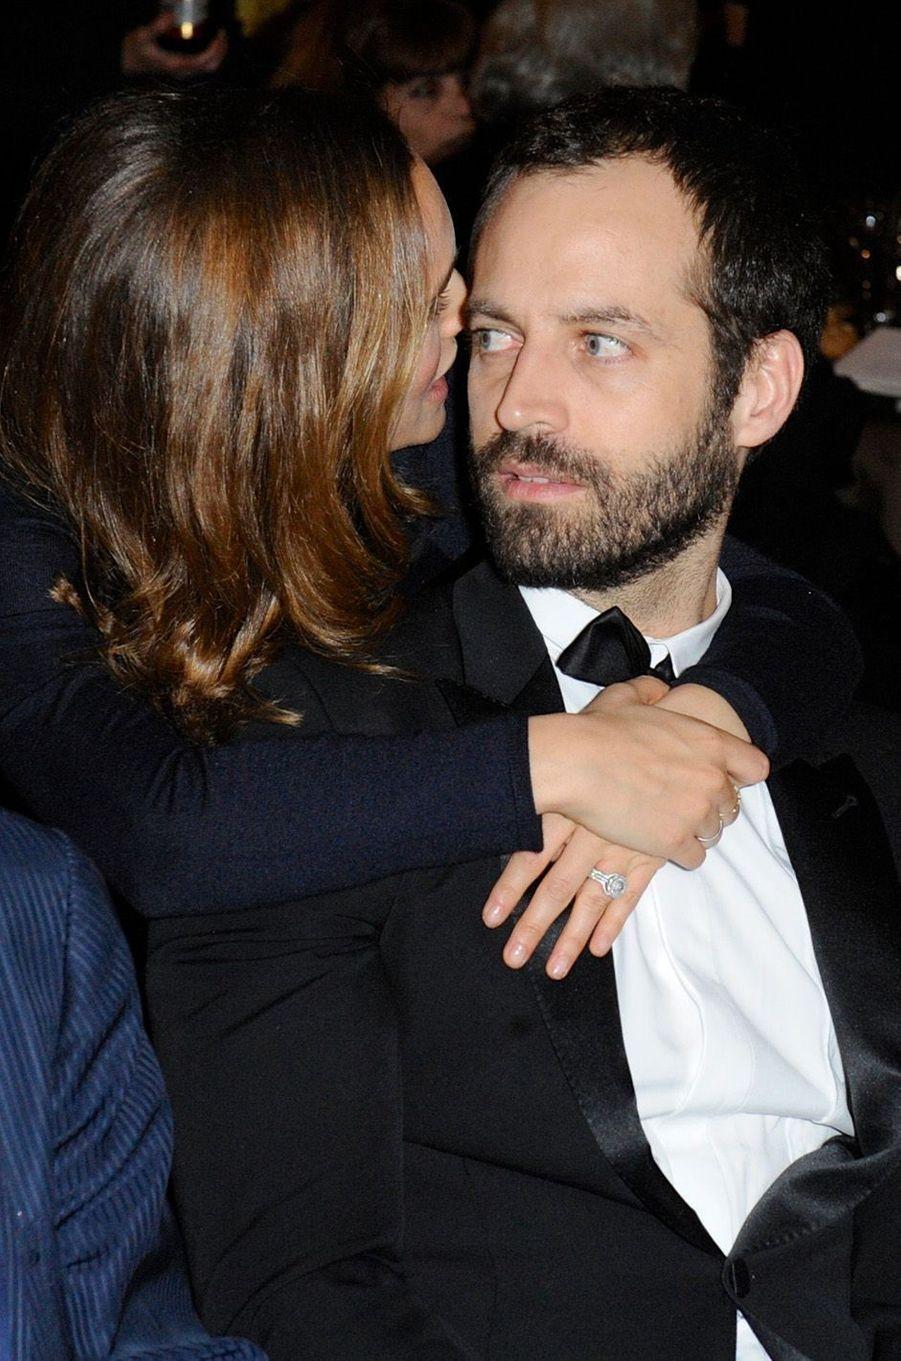 Natalie Portman et Benjamin Millepied à l'Opéra Garnier, en janvier 2015.